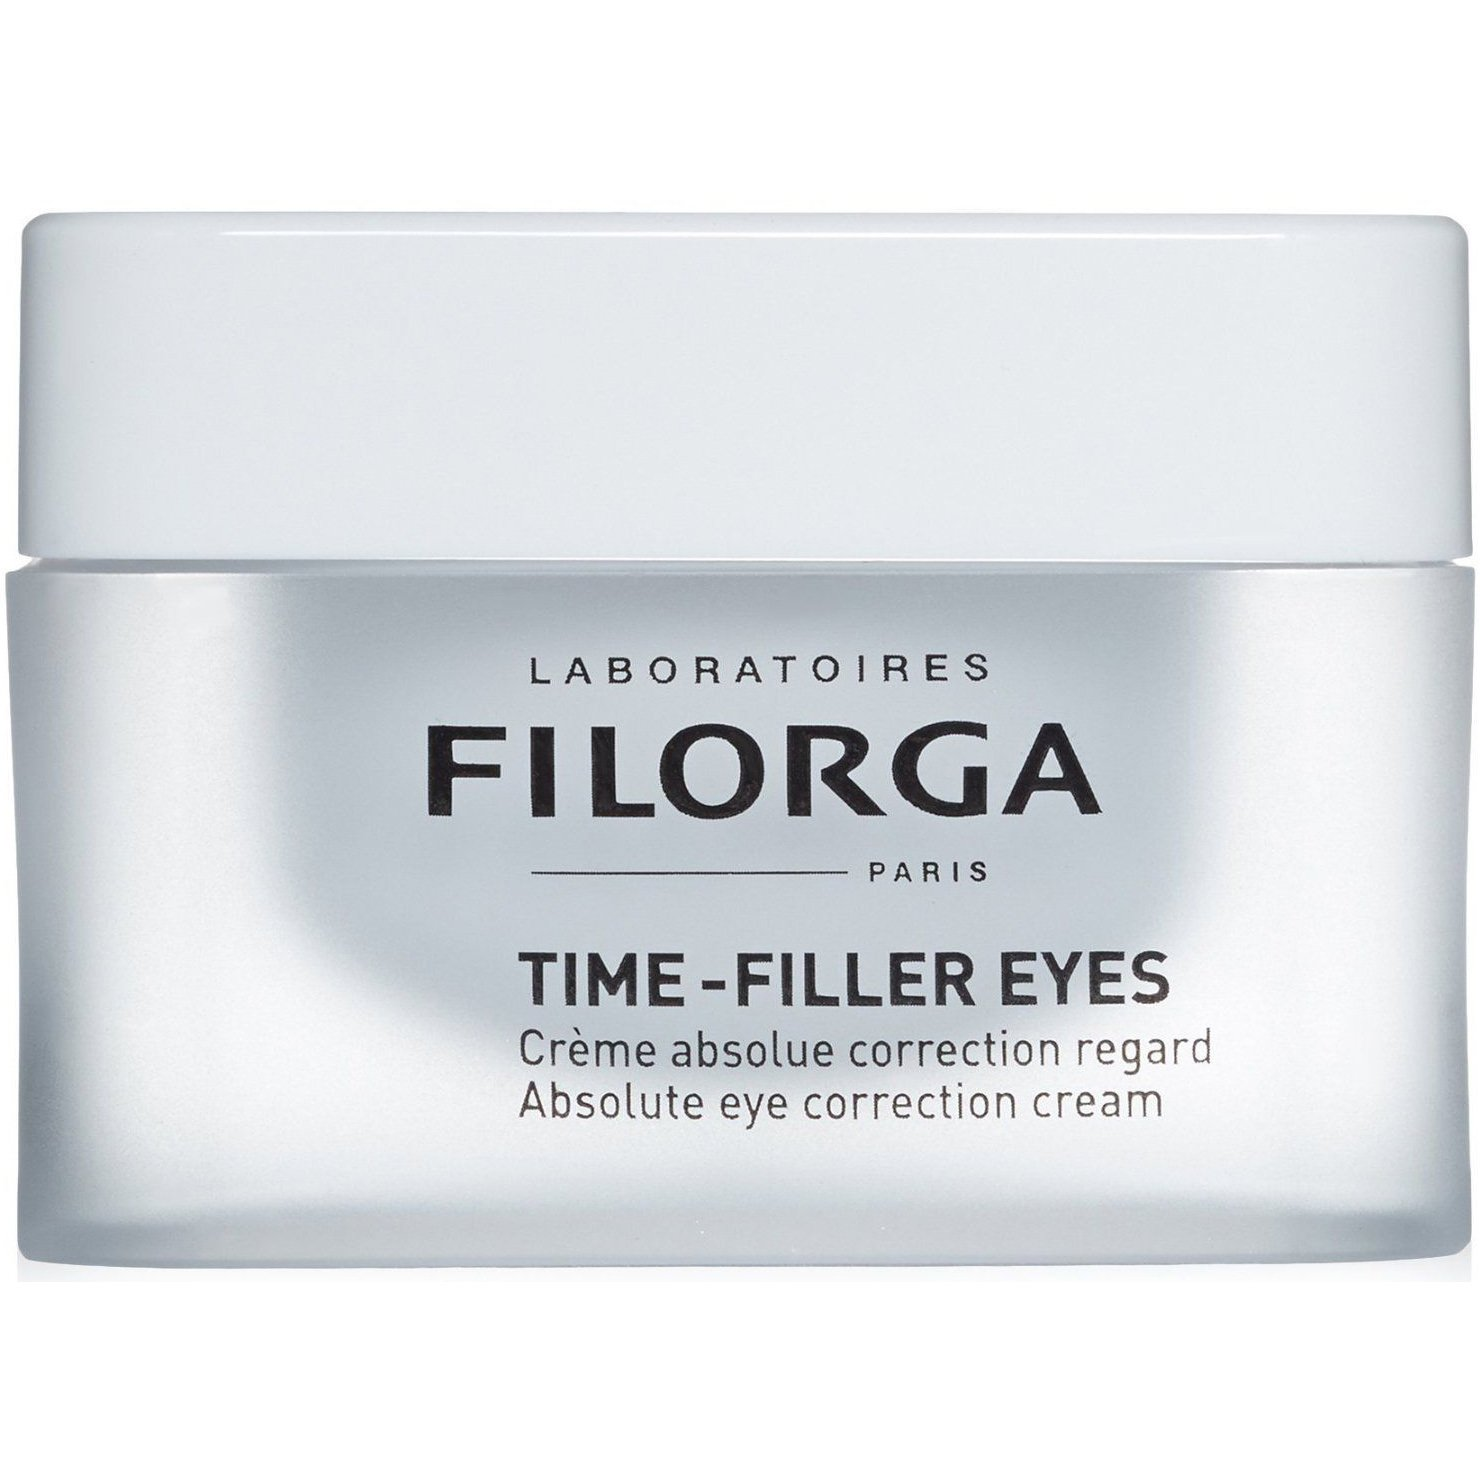 Filorga Time-Filler Eyes Αντιρυτιδική & Ενυδατική Κρέμα Ματιών Απόλυτης Διόρθωσης των Σημαδιών Γήρανσης 15ml